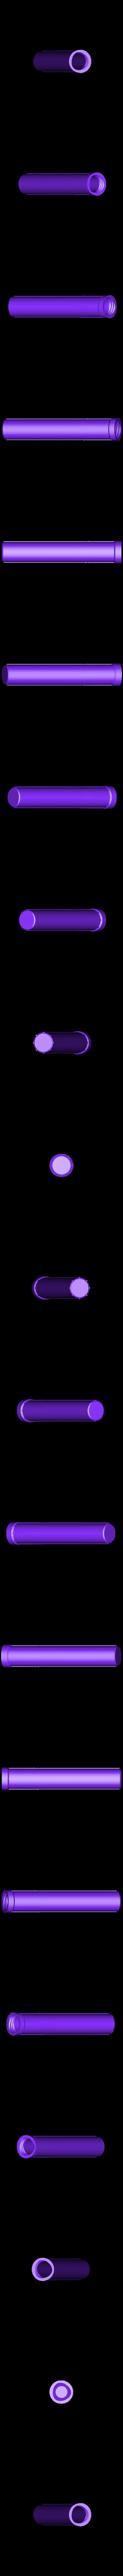 BatterySlot_Body_19.6mm.stl Download free STL file Bike Handlebar AA Battery Slot • 3D printable model, CyberCyclist